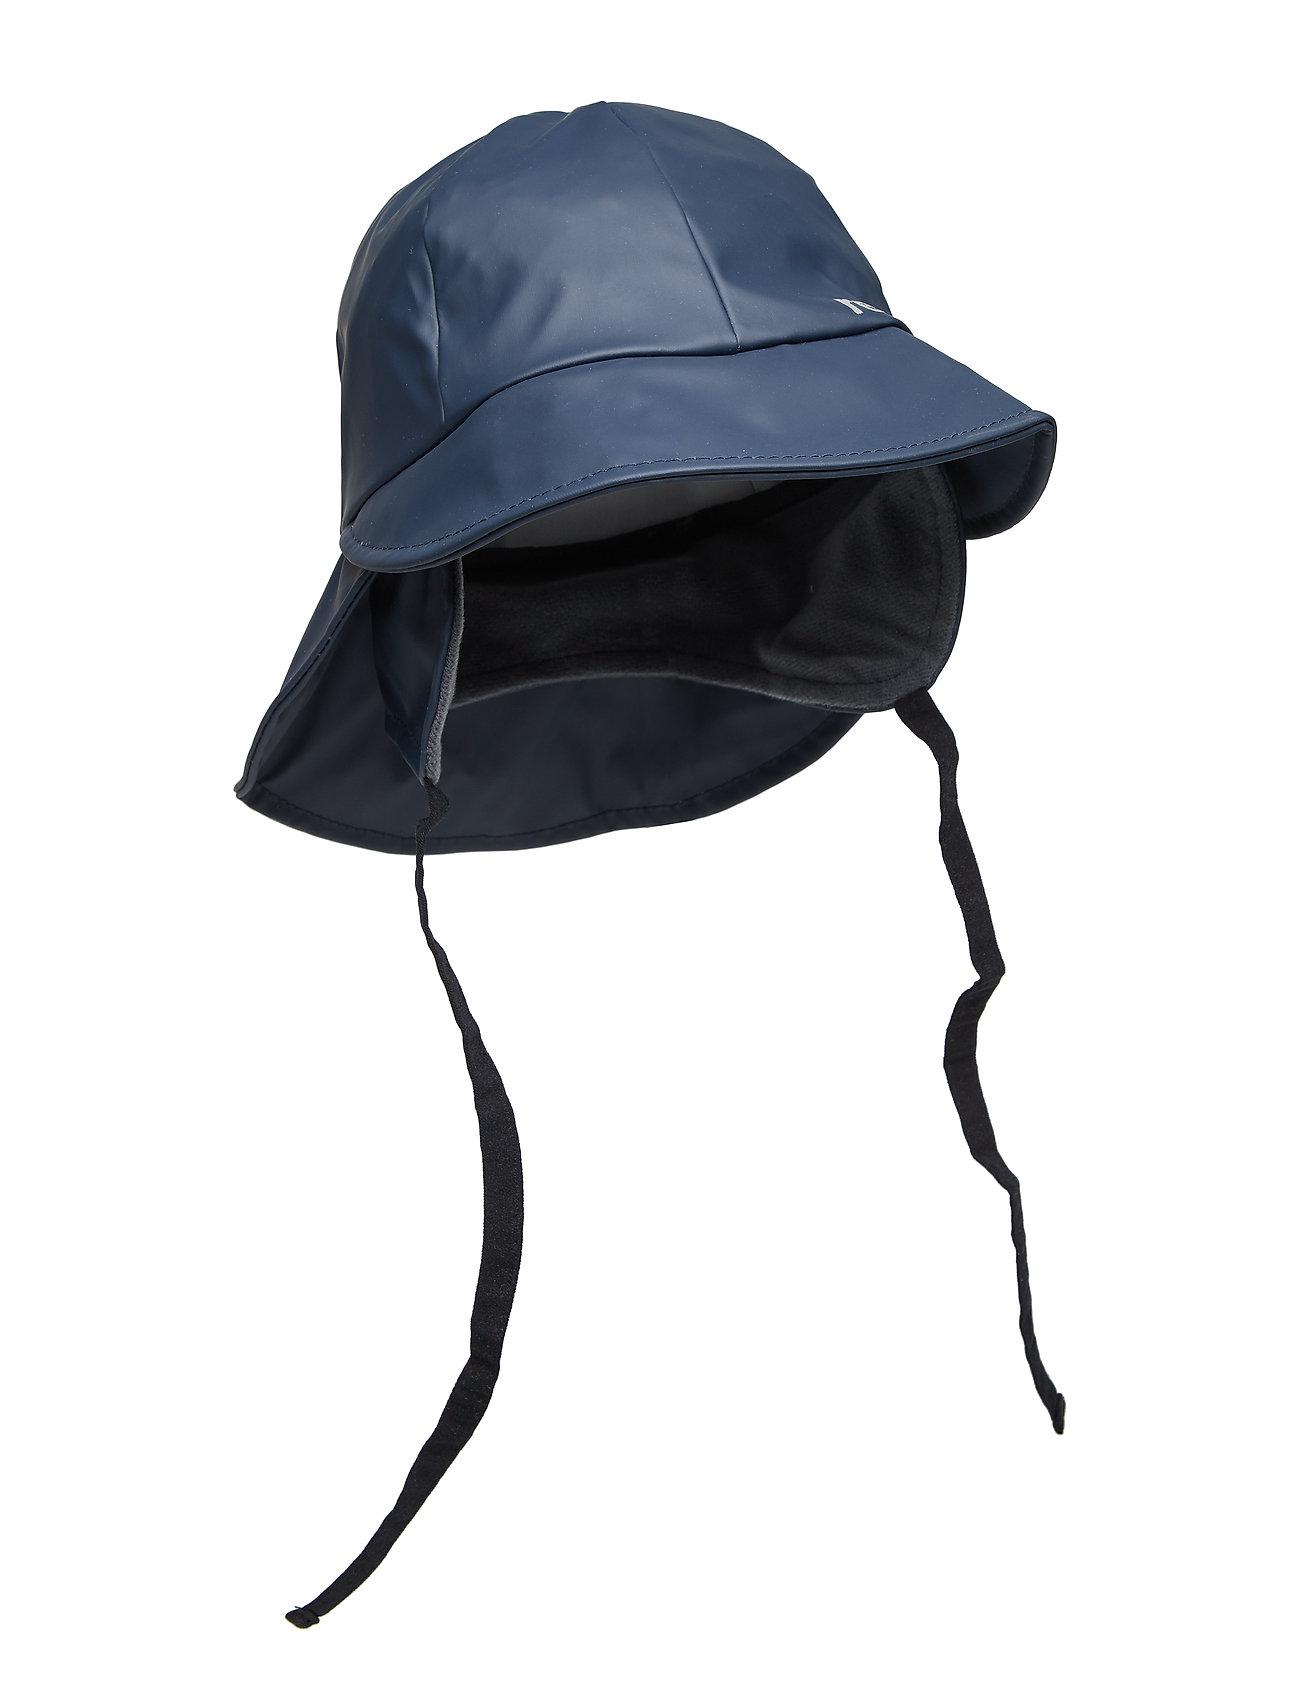 Reima Rainy - BLUE